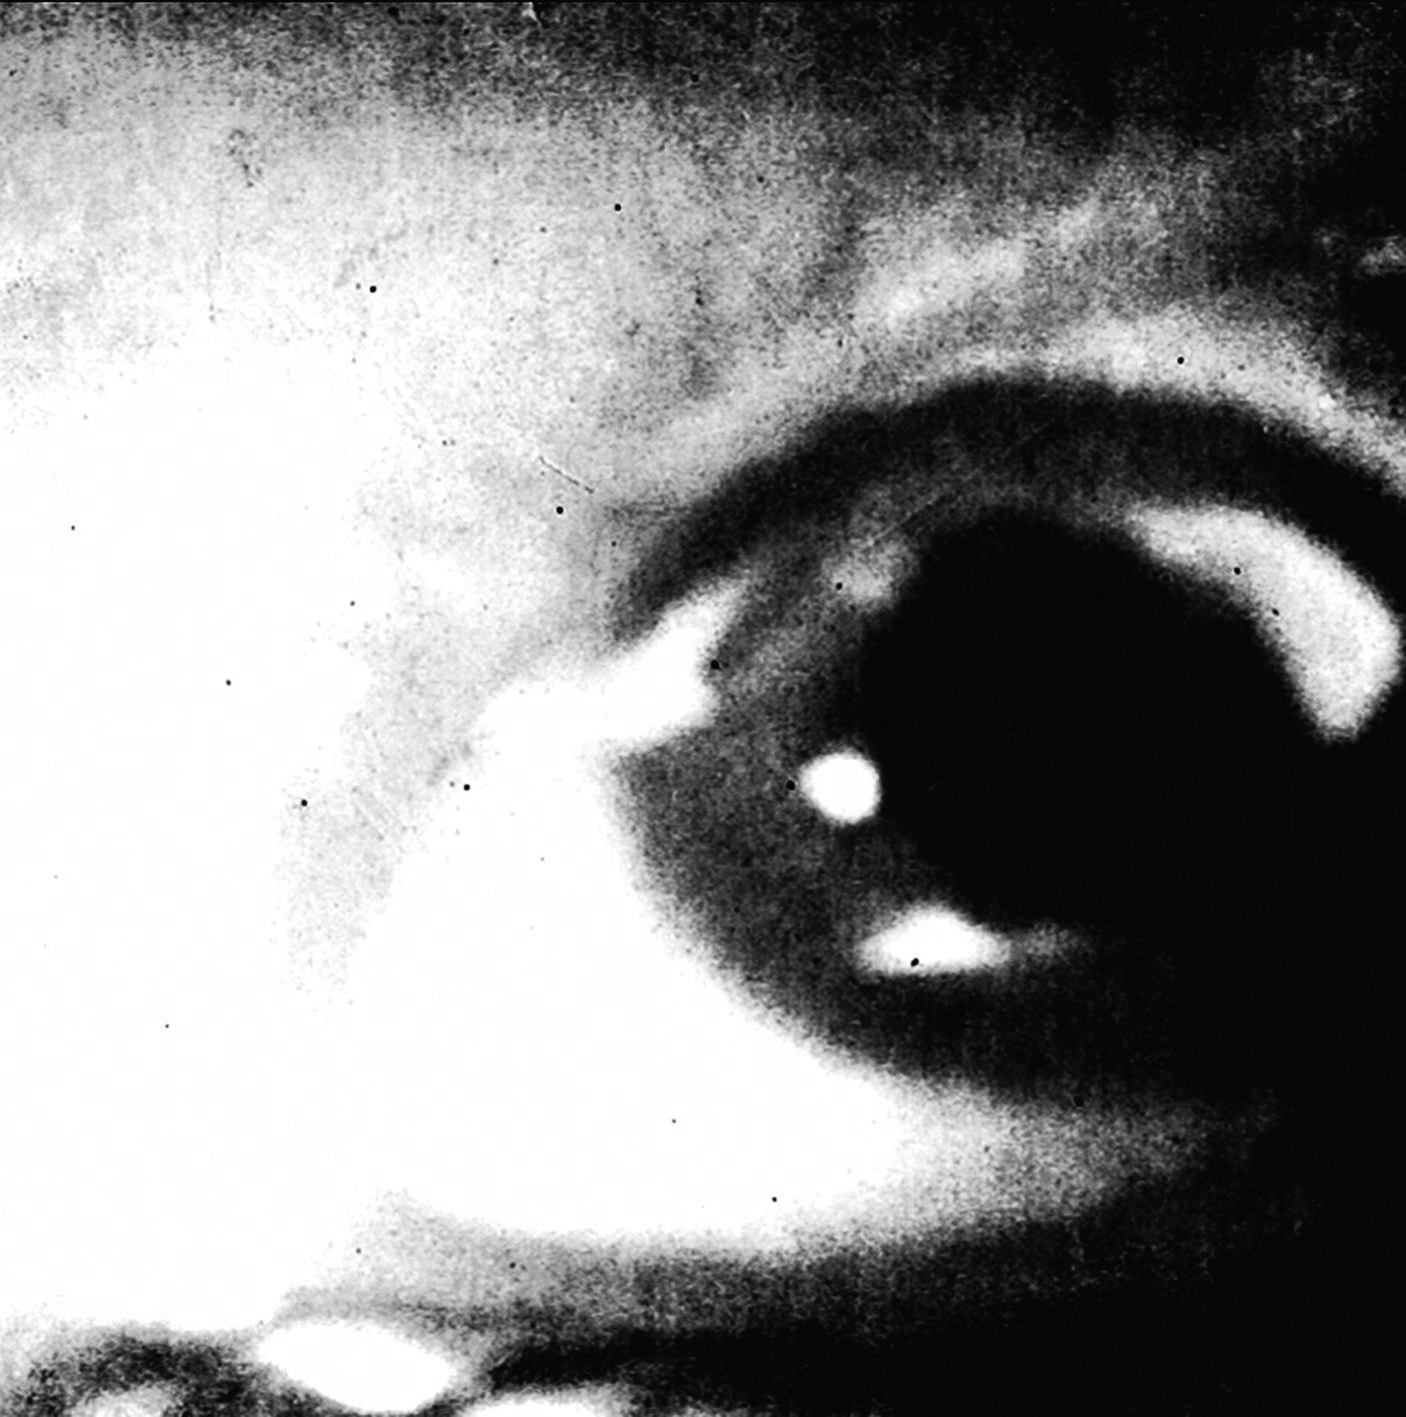 Natrejeis «Jeis» (2020)